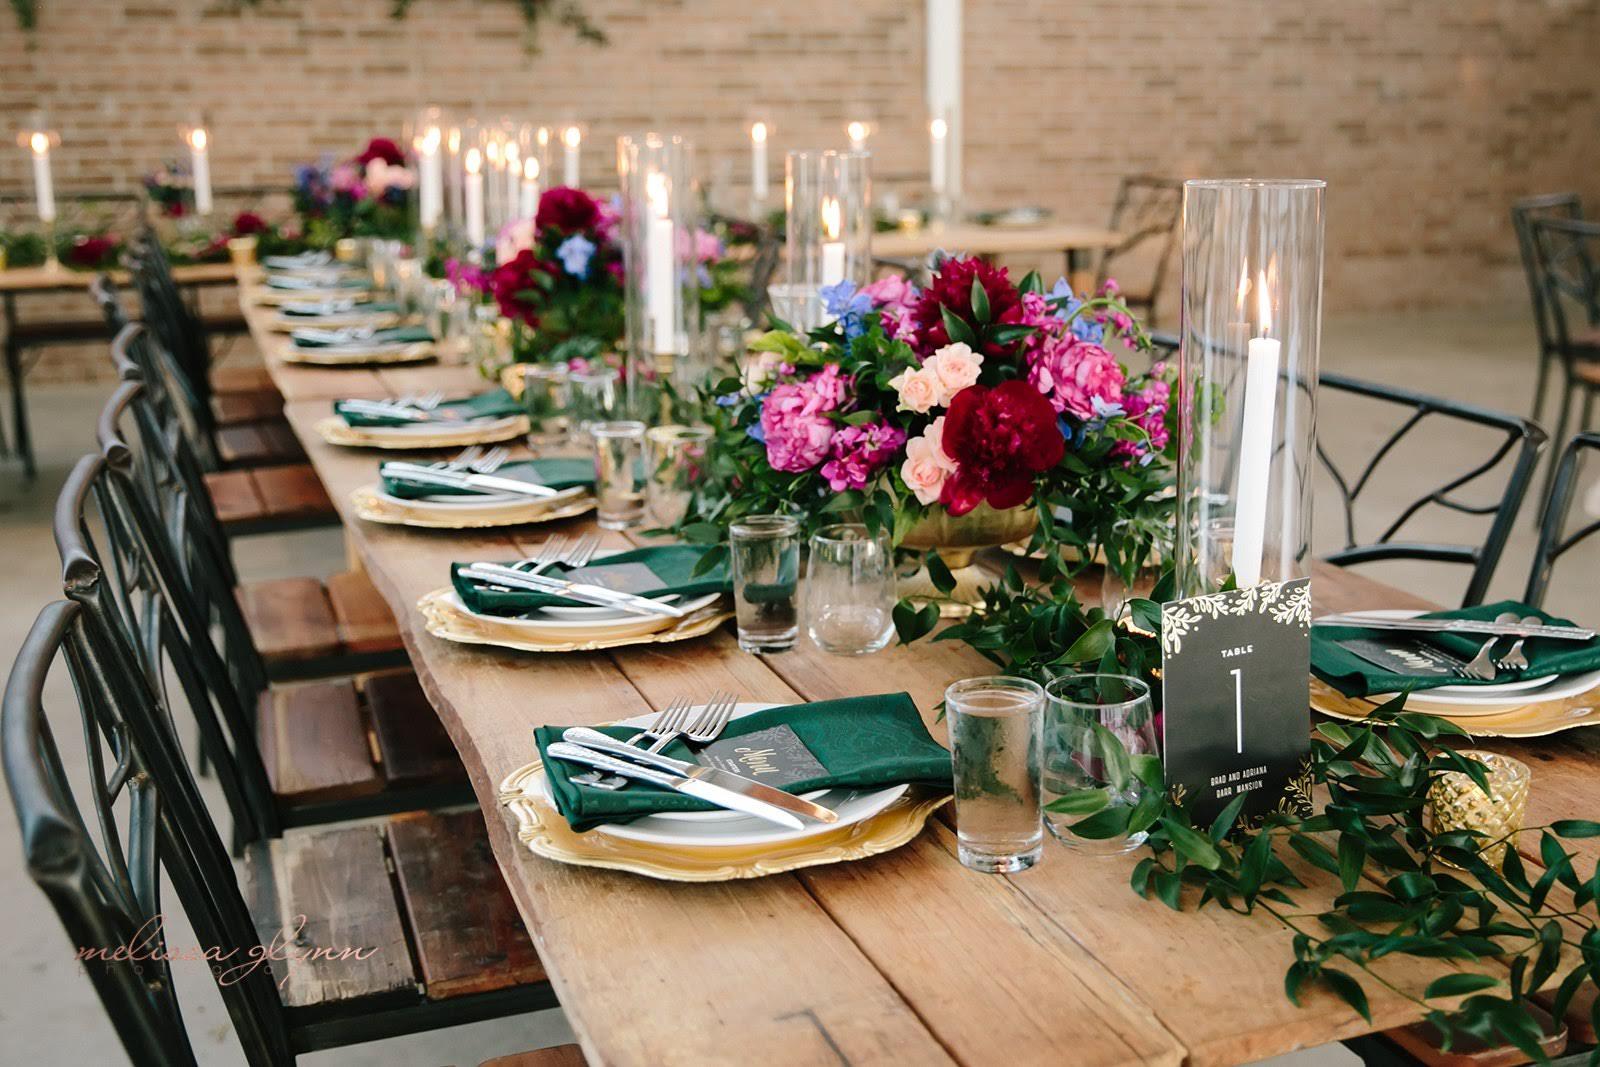 Head table at wedding reception